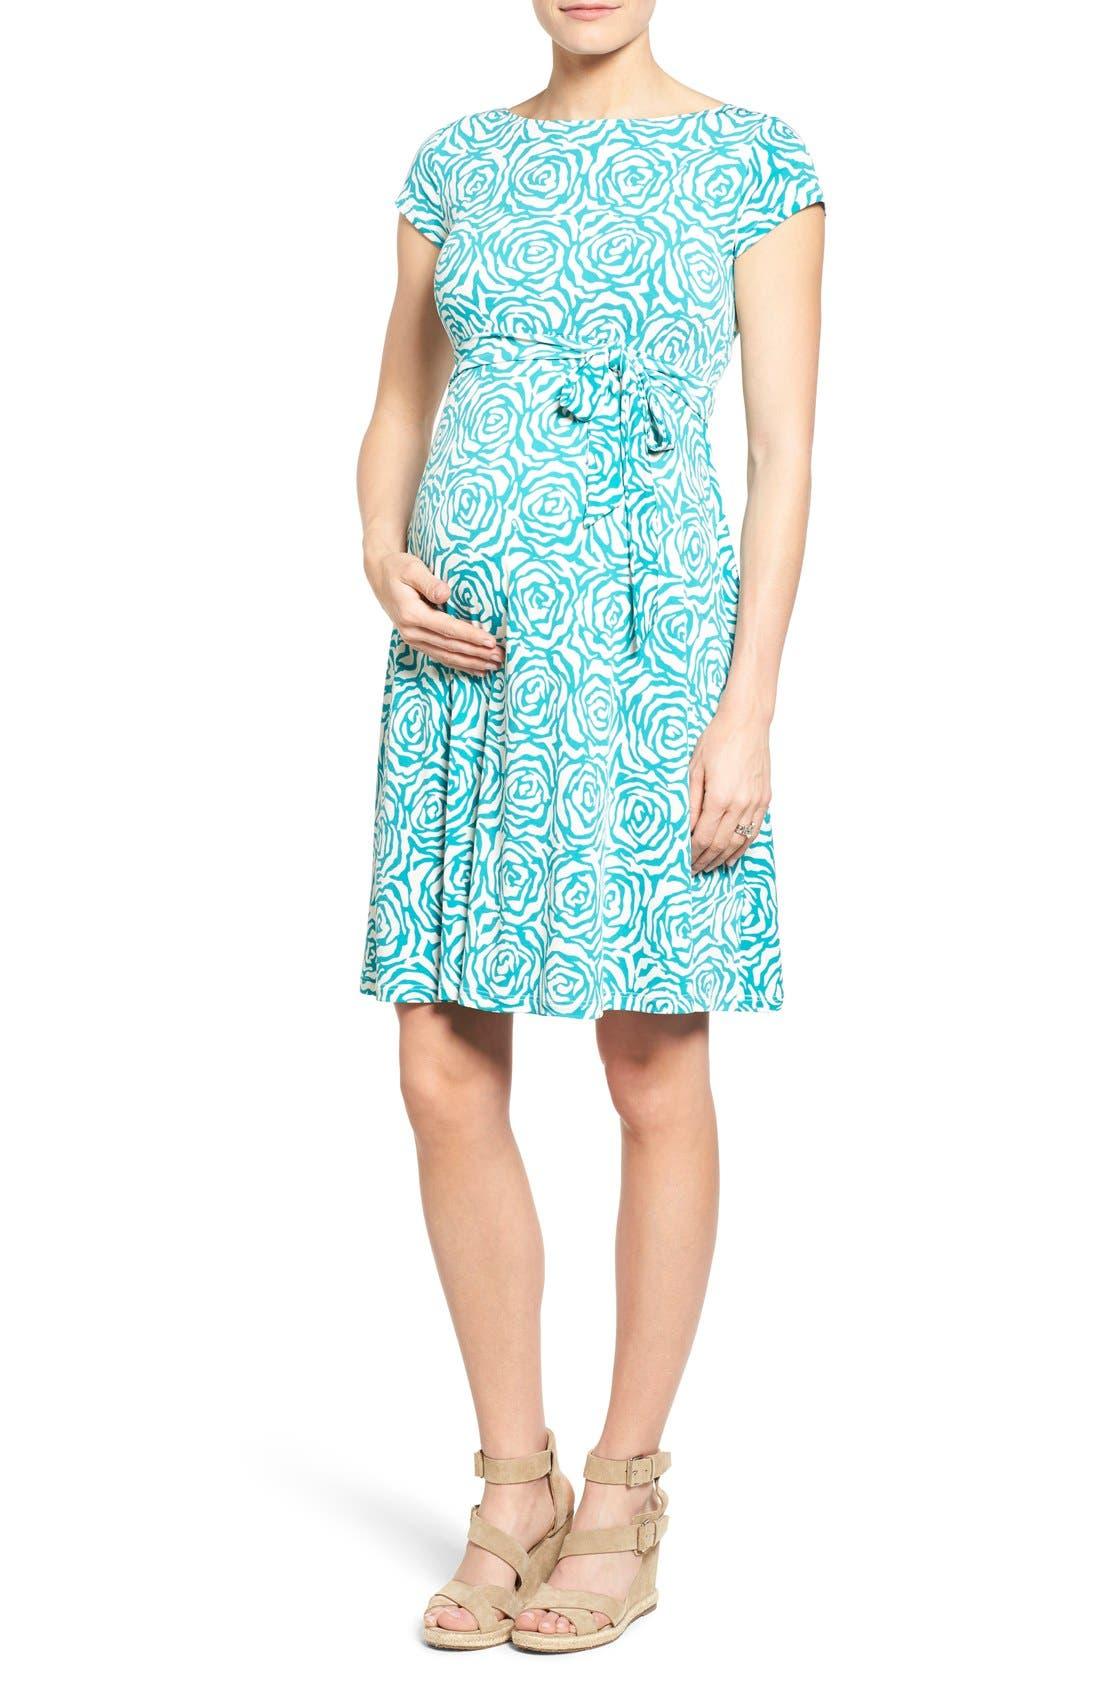 Leota 'Ilana' A-Line Maternity Dress